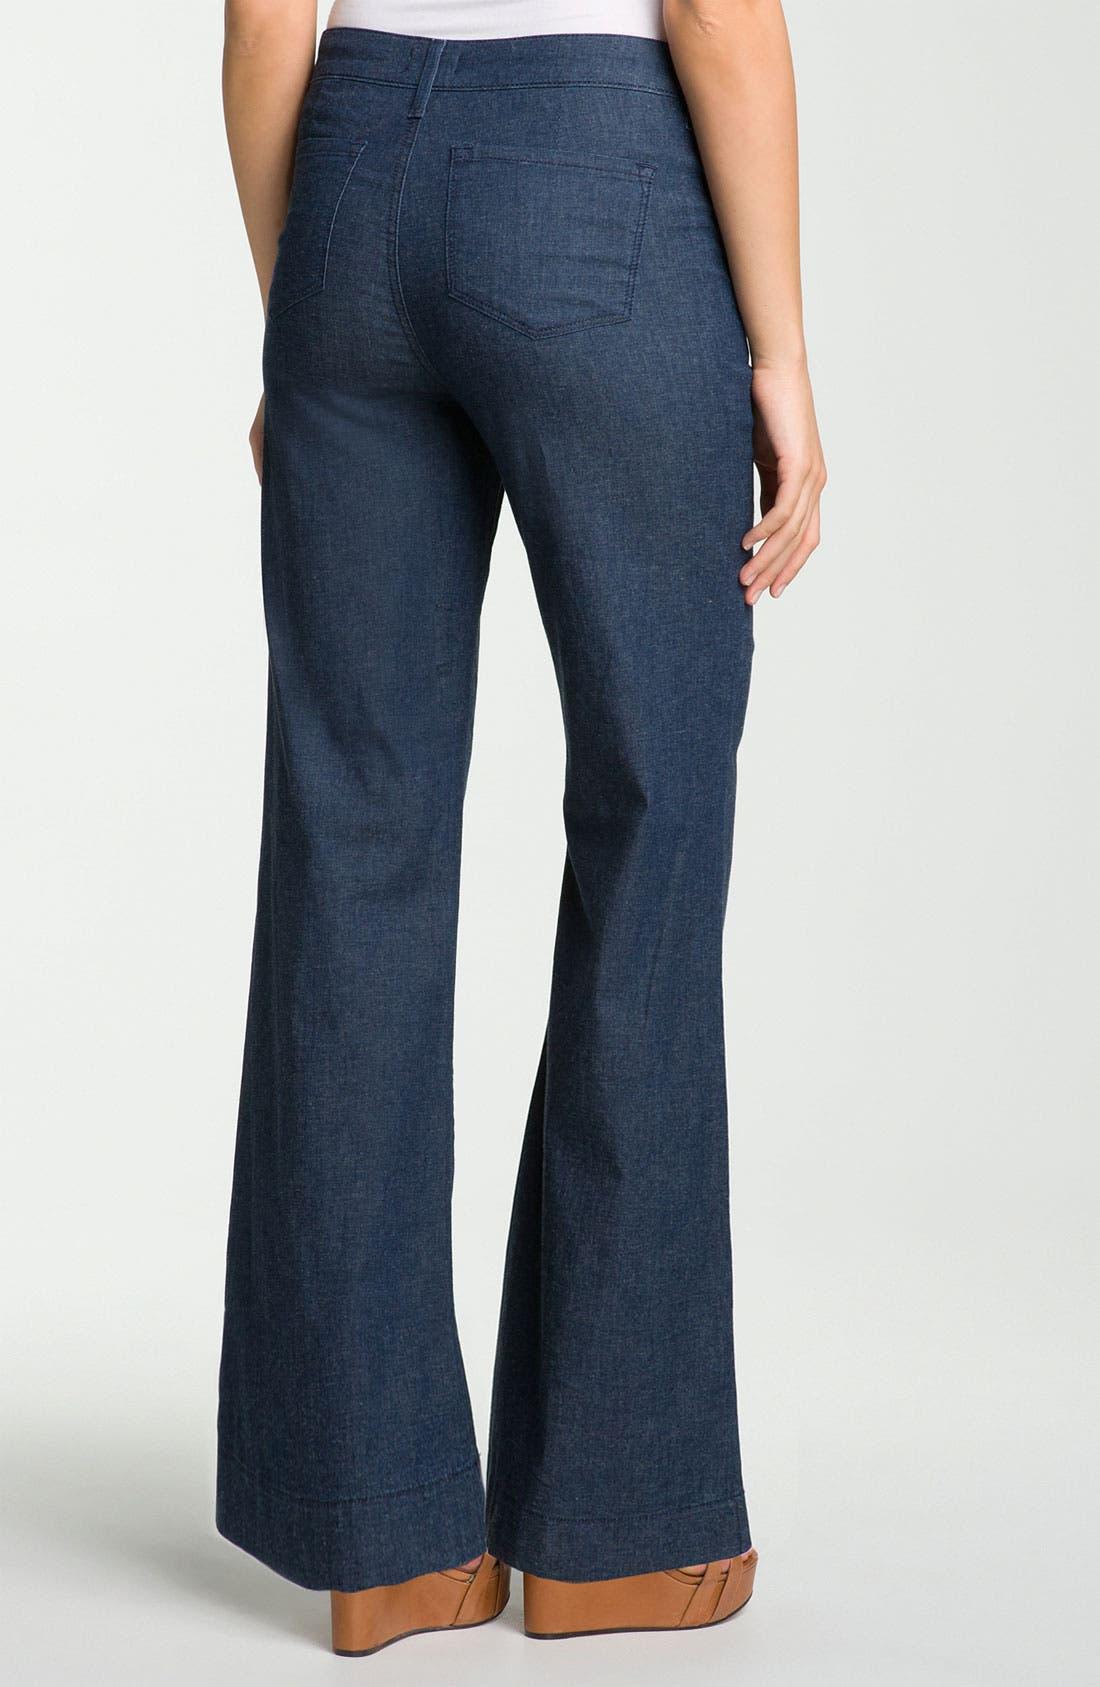 Alternate Image 2  - NYDJ 'Tina Sailor' Wide Leg Jeans (Petite)